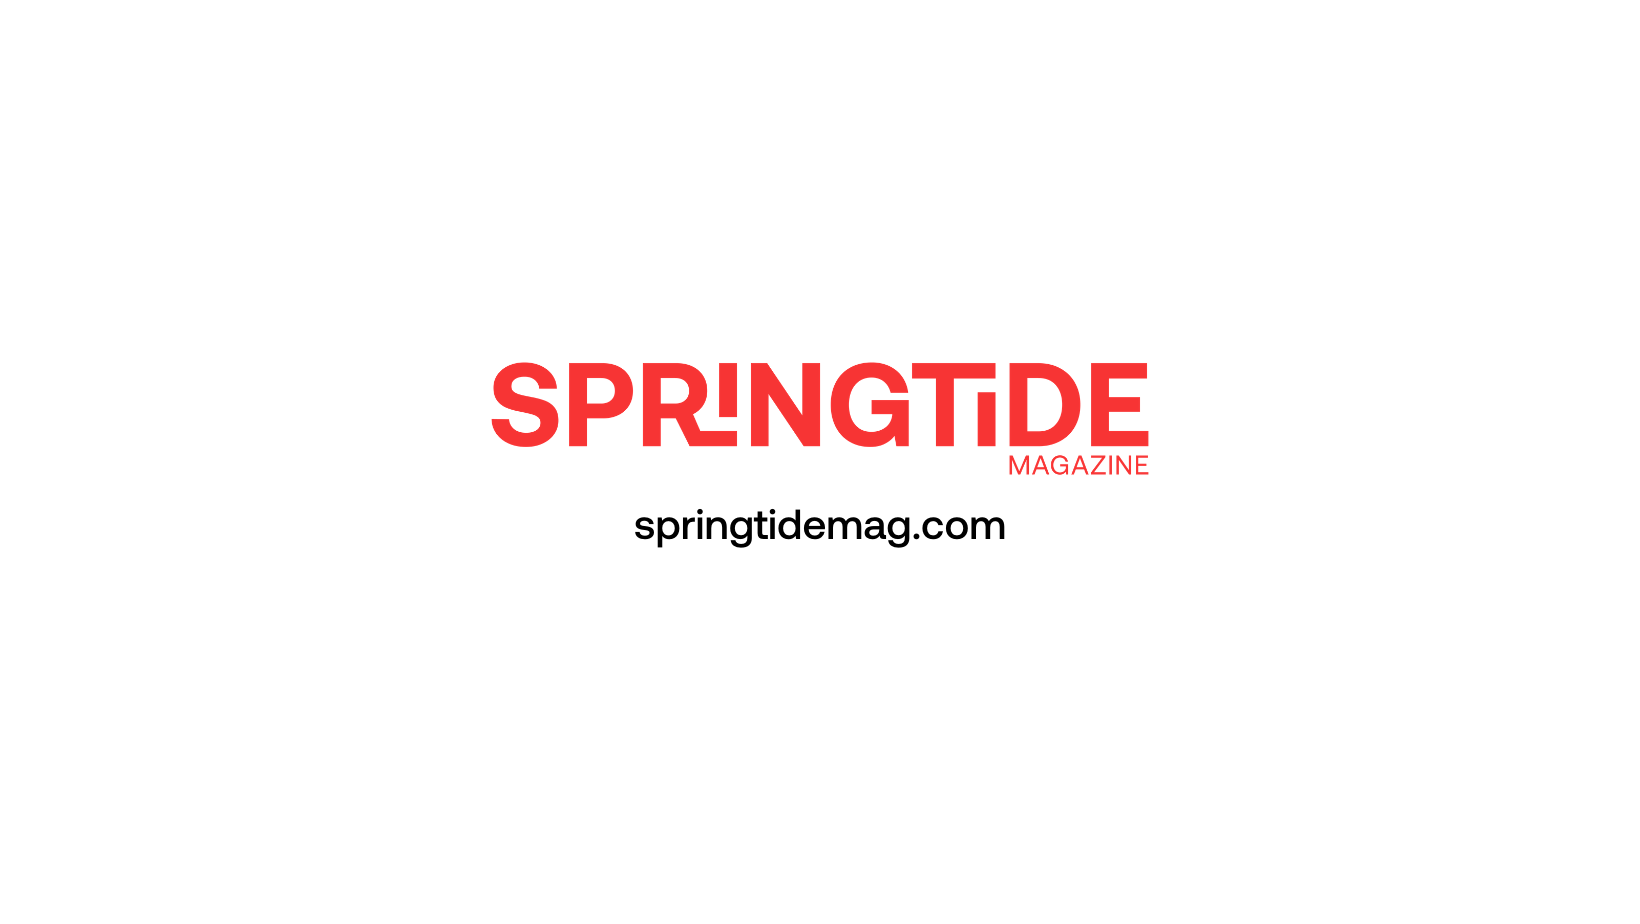 springtide-magazine